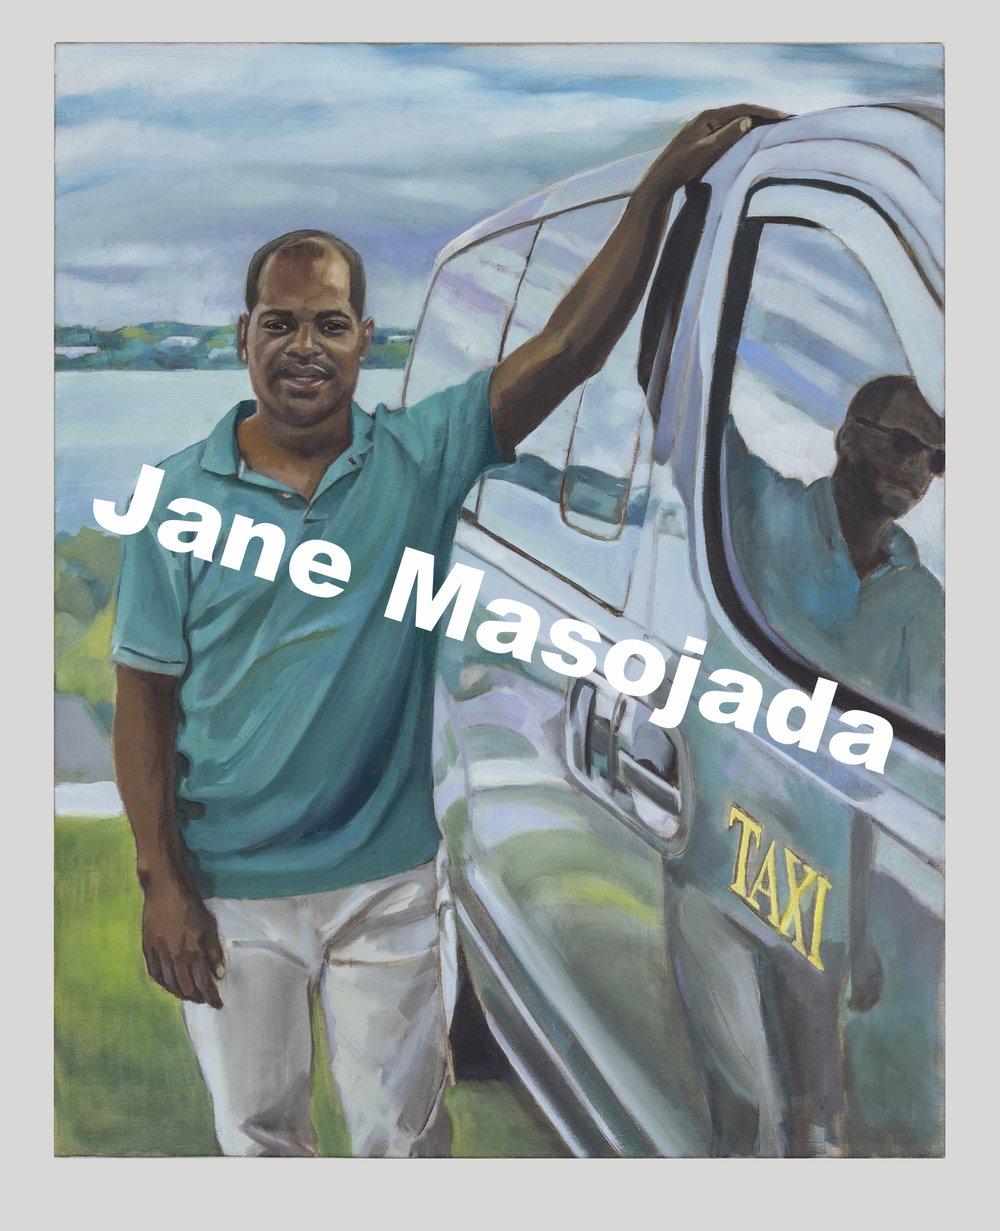 Jane Masojada Bermuda-2018-04-09-7879M.jpg